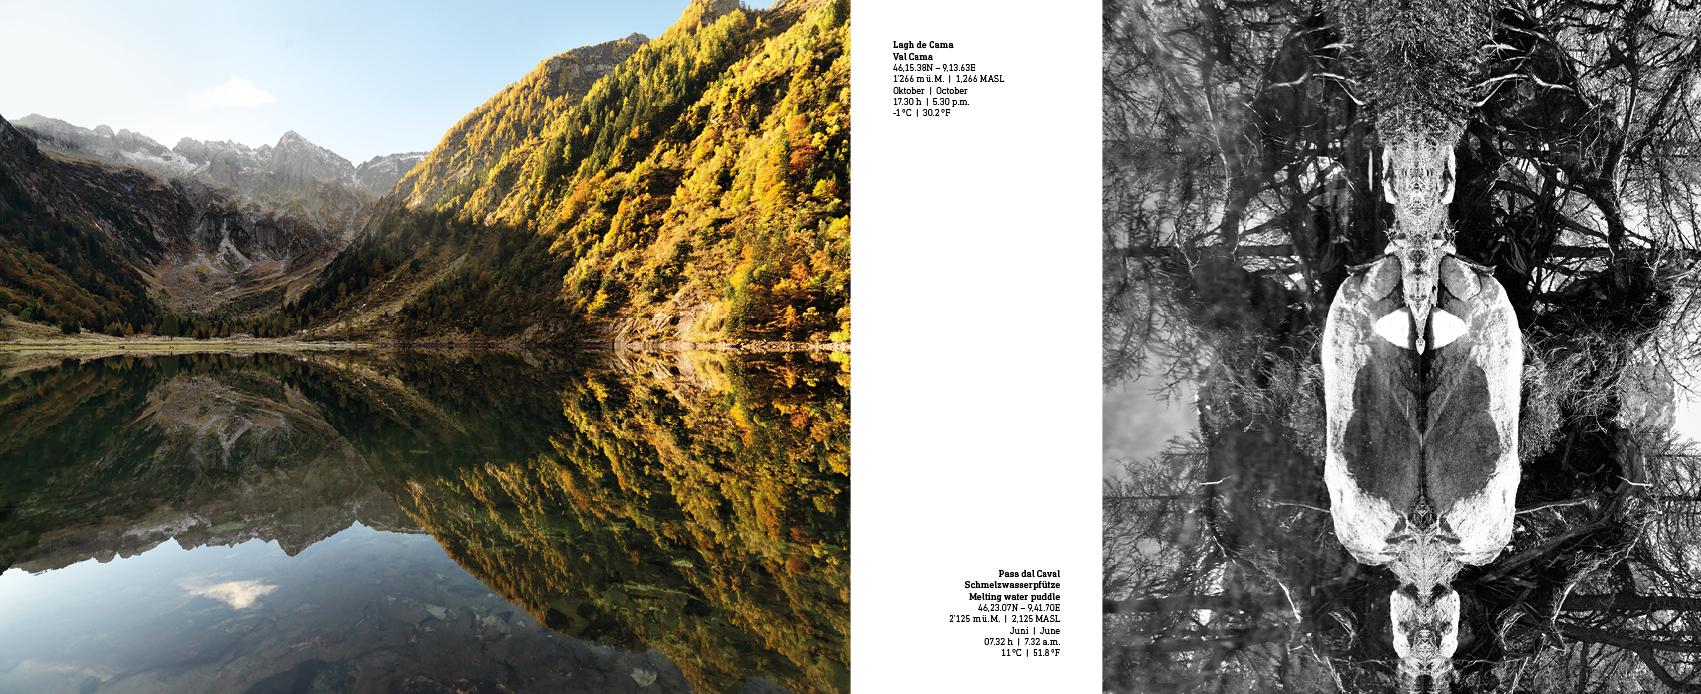 Seite 94-95